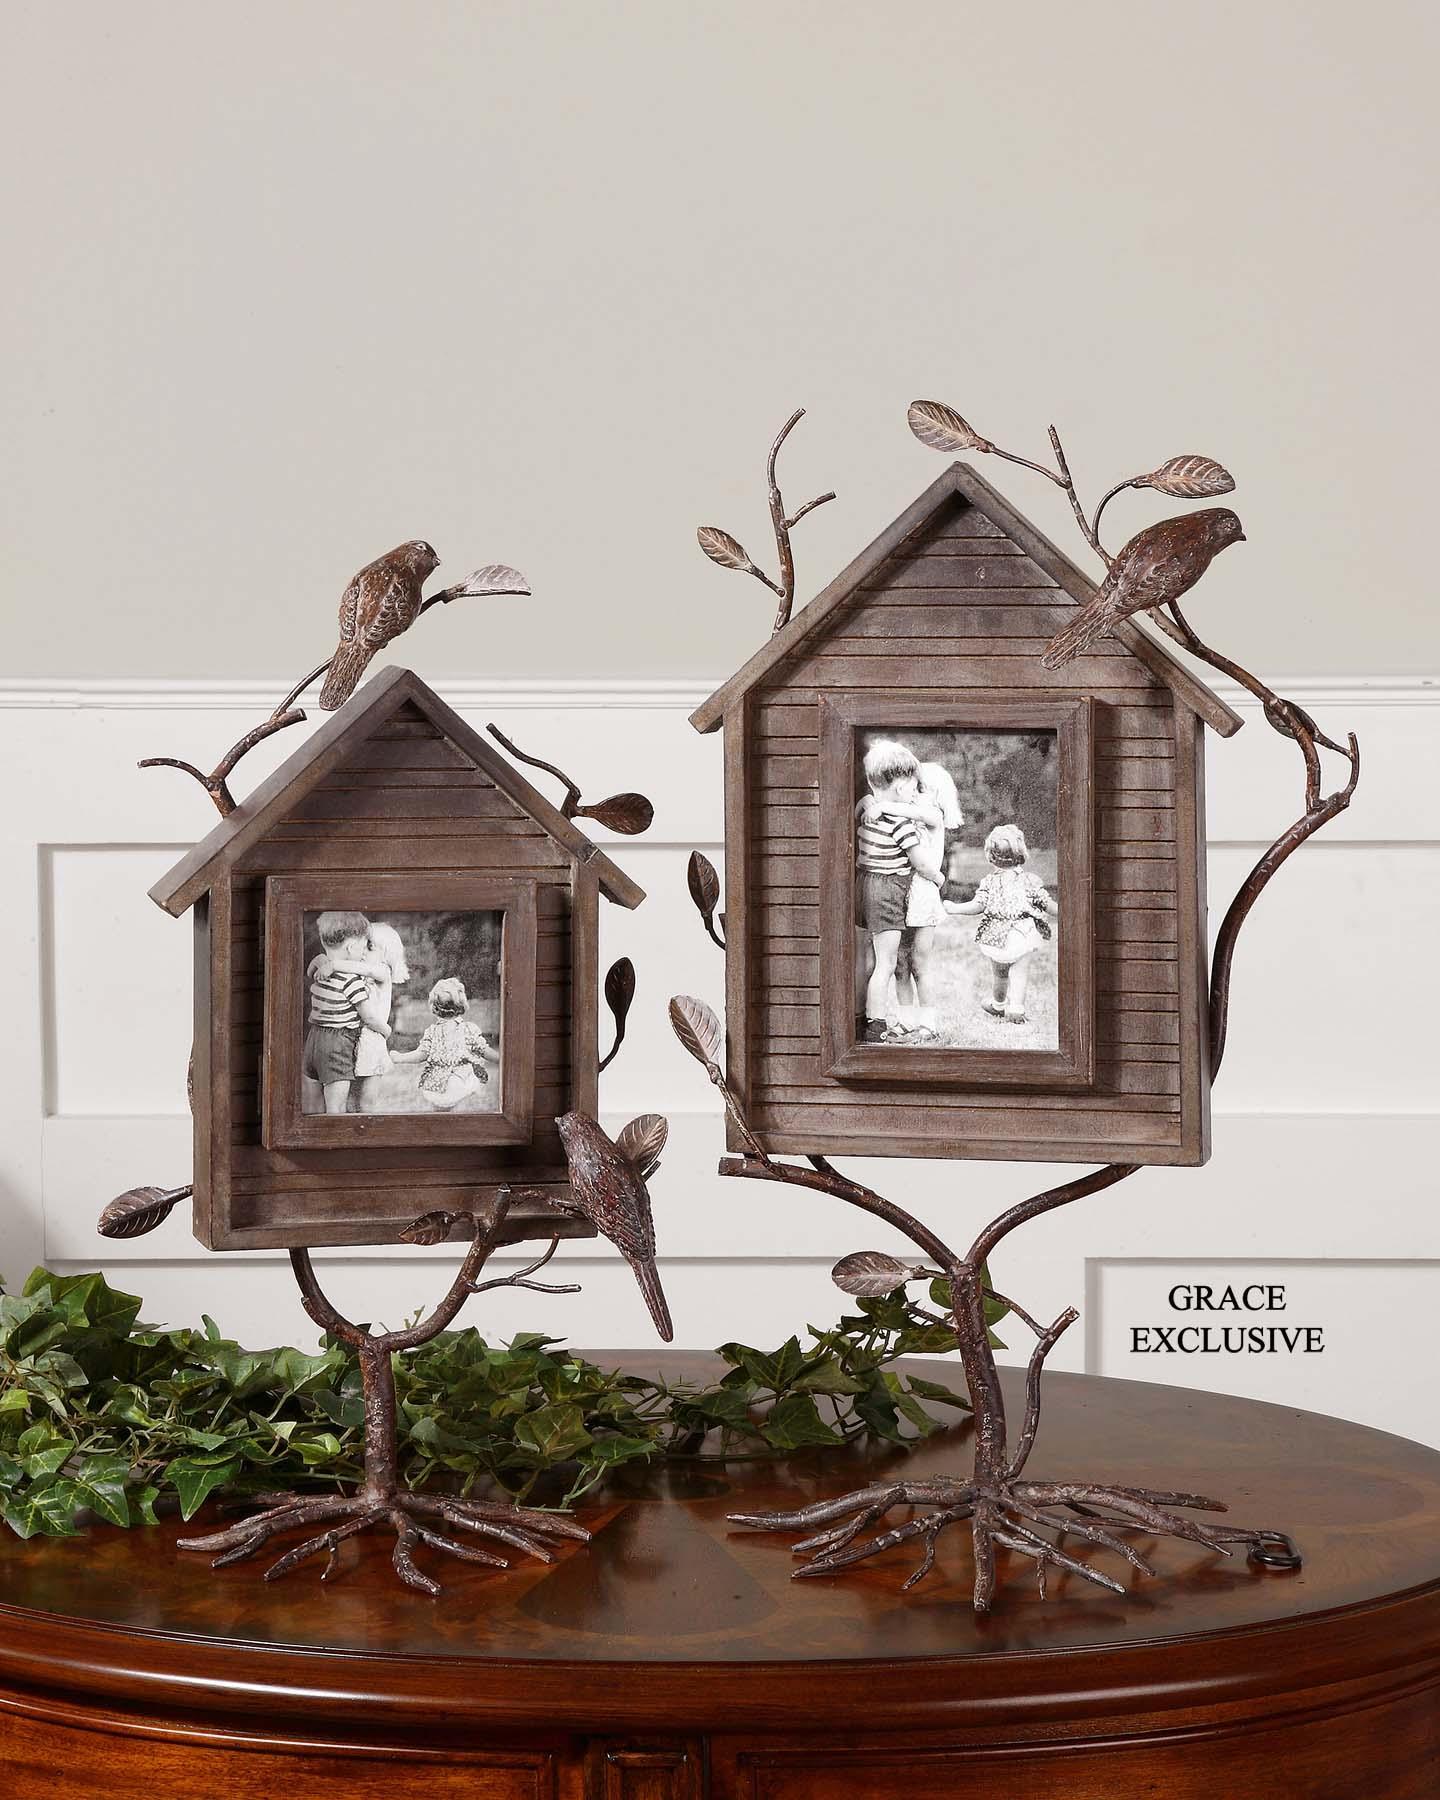 Uttermost 18528 Bird house photo frames set/2 (с дефектом) - фото 2